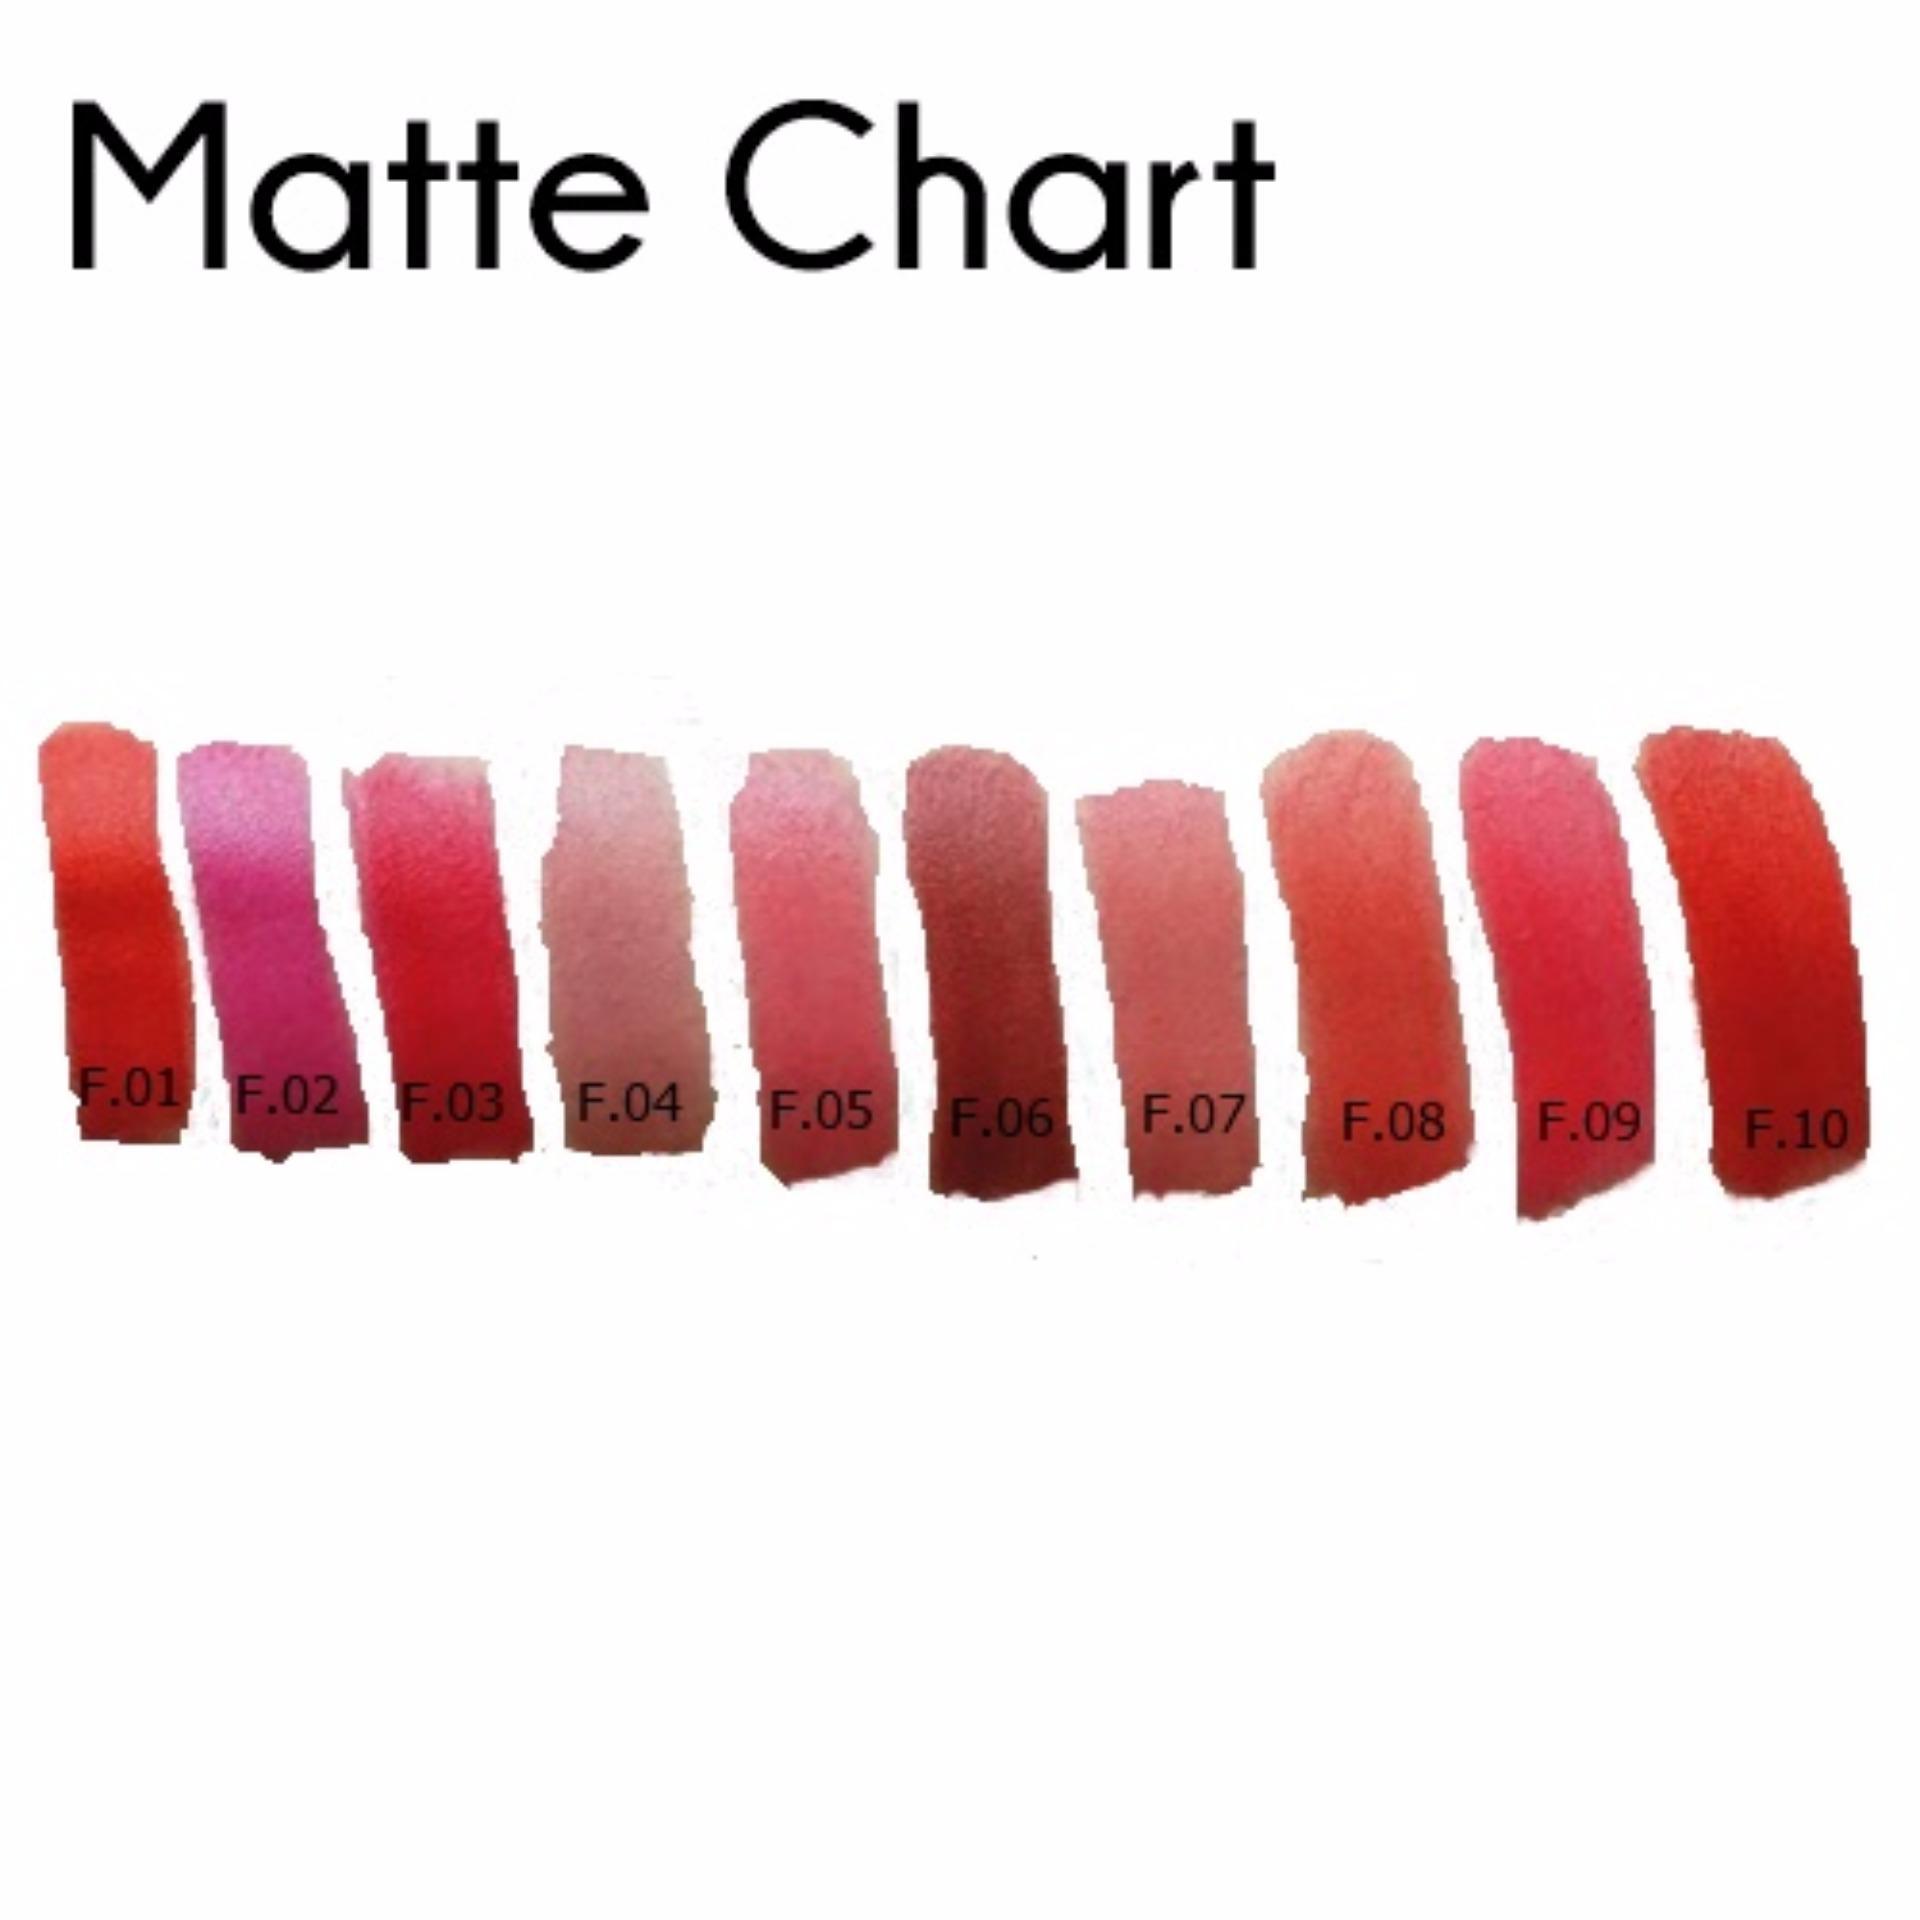 Fanbo Fantastic Matte Lipstick - F.06 Edgy Deep Brown ...